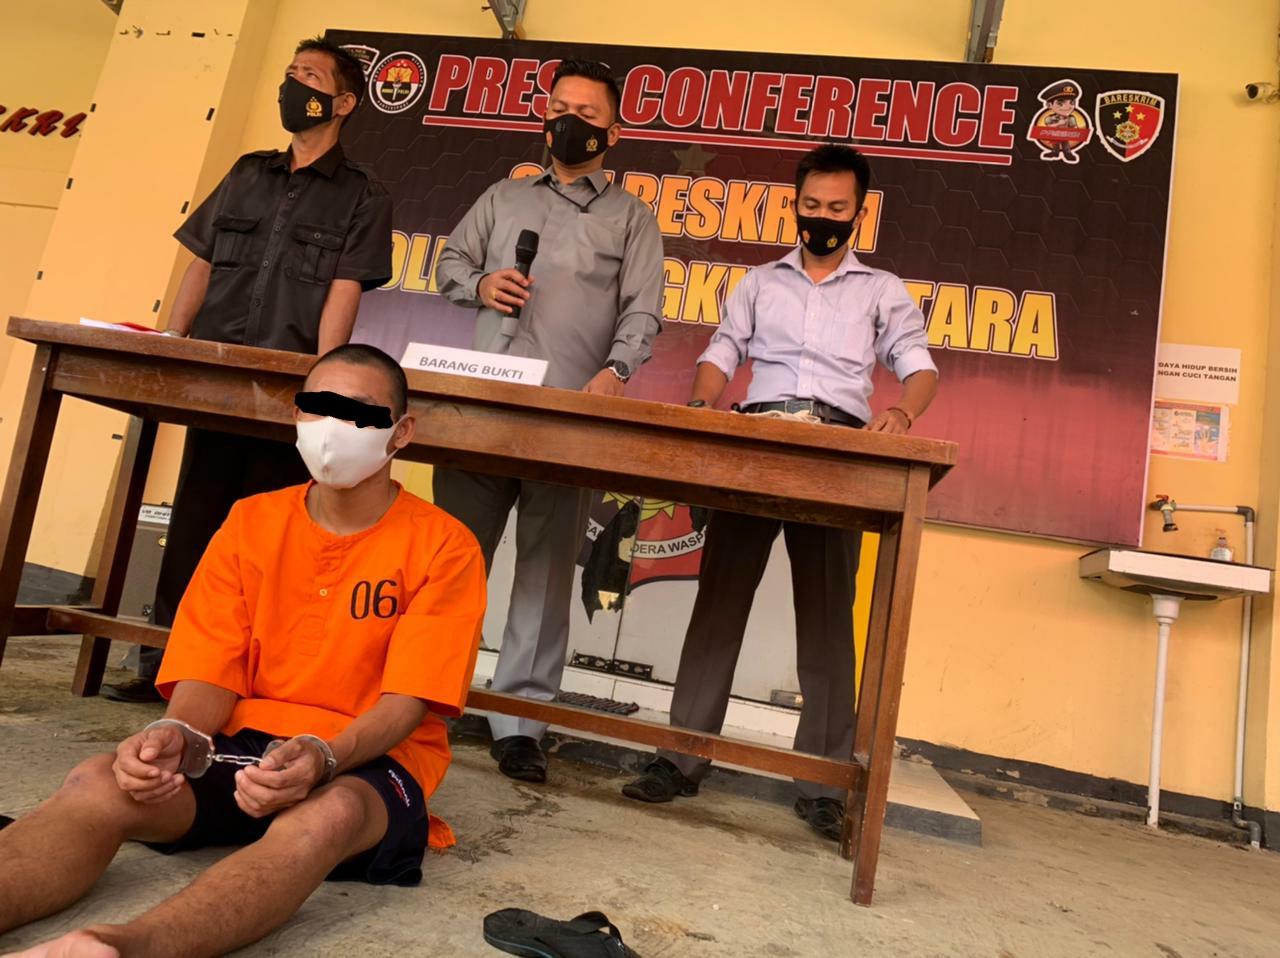 Diduga Melakukan Percobaan Pemerkosaan, Warga Argamakmur Diamankan Polres Bengkulu Utara